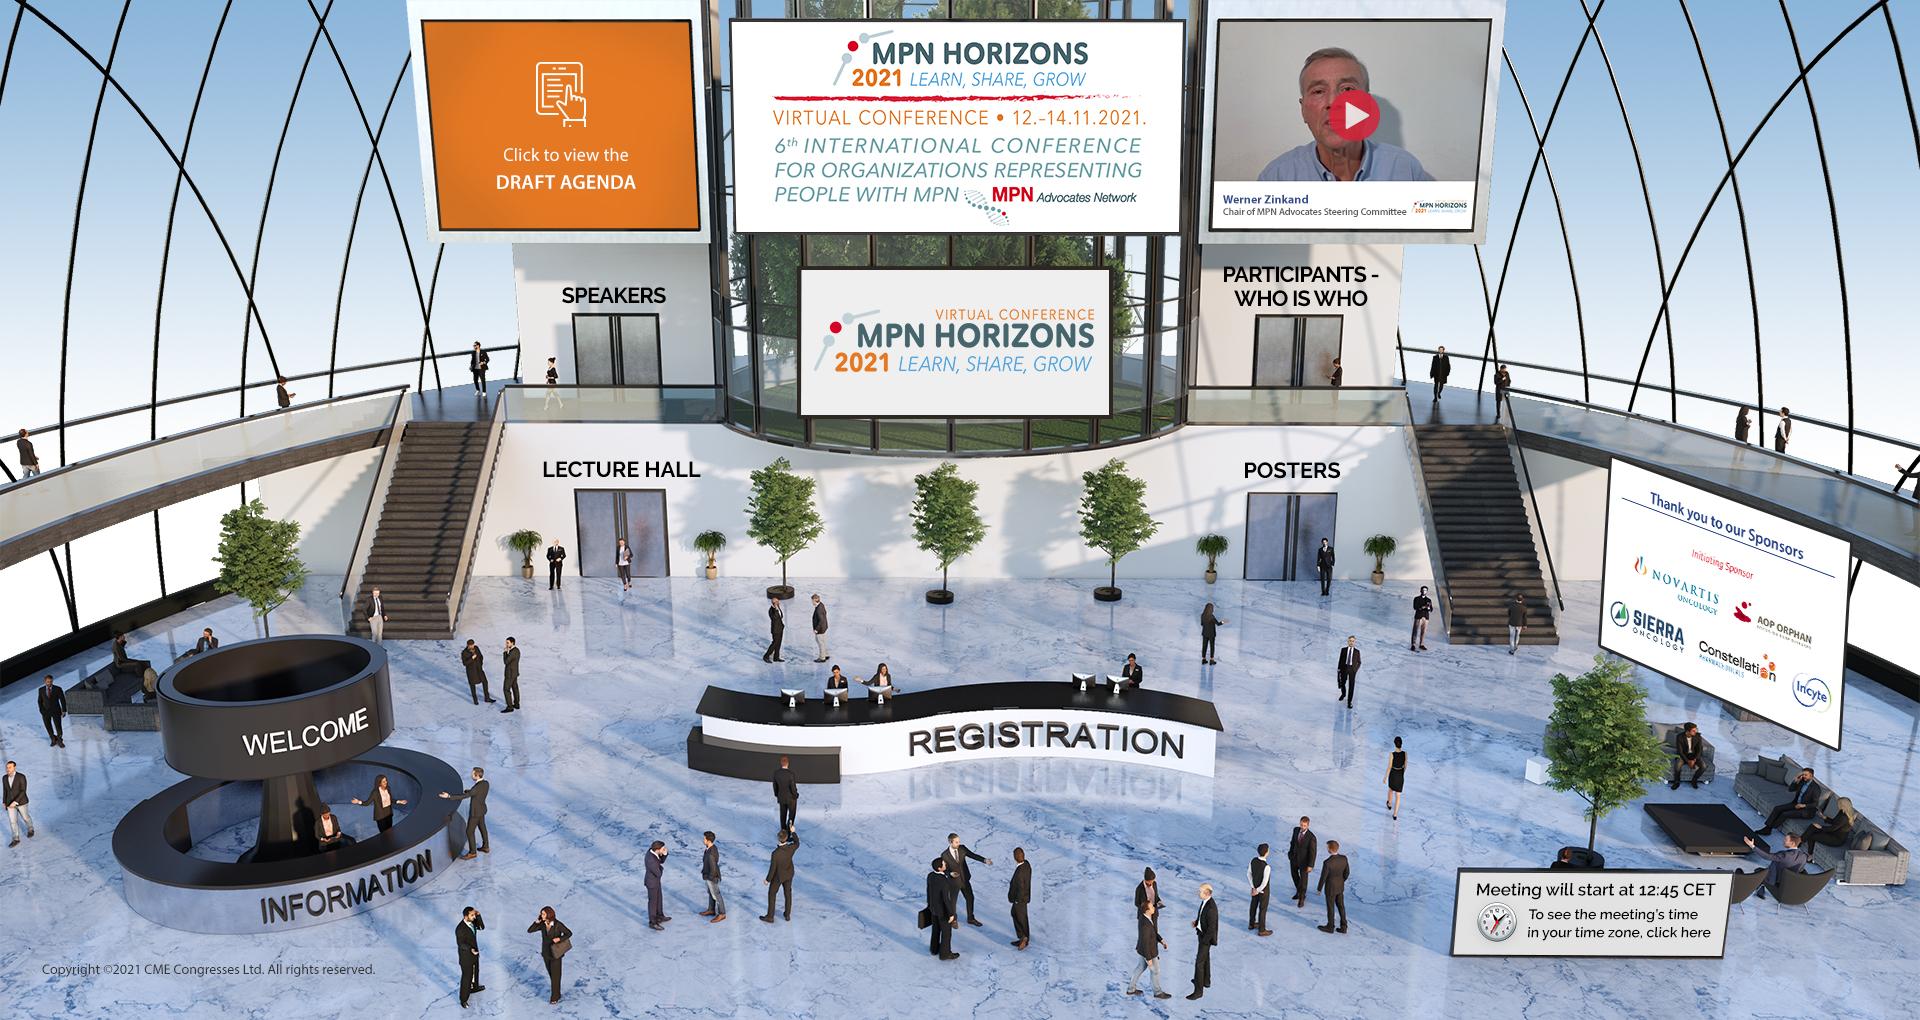 MPN Horizons 2021 Virtual Conference